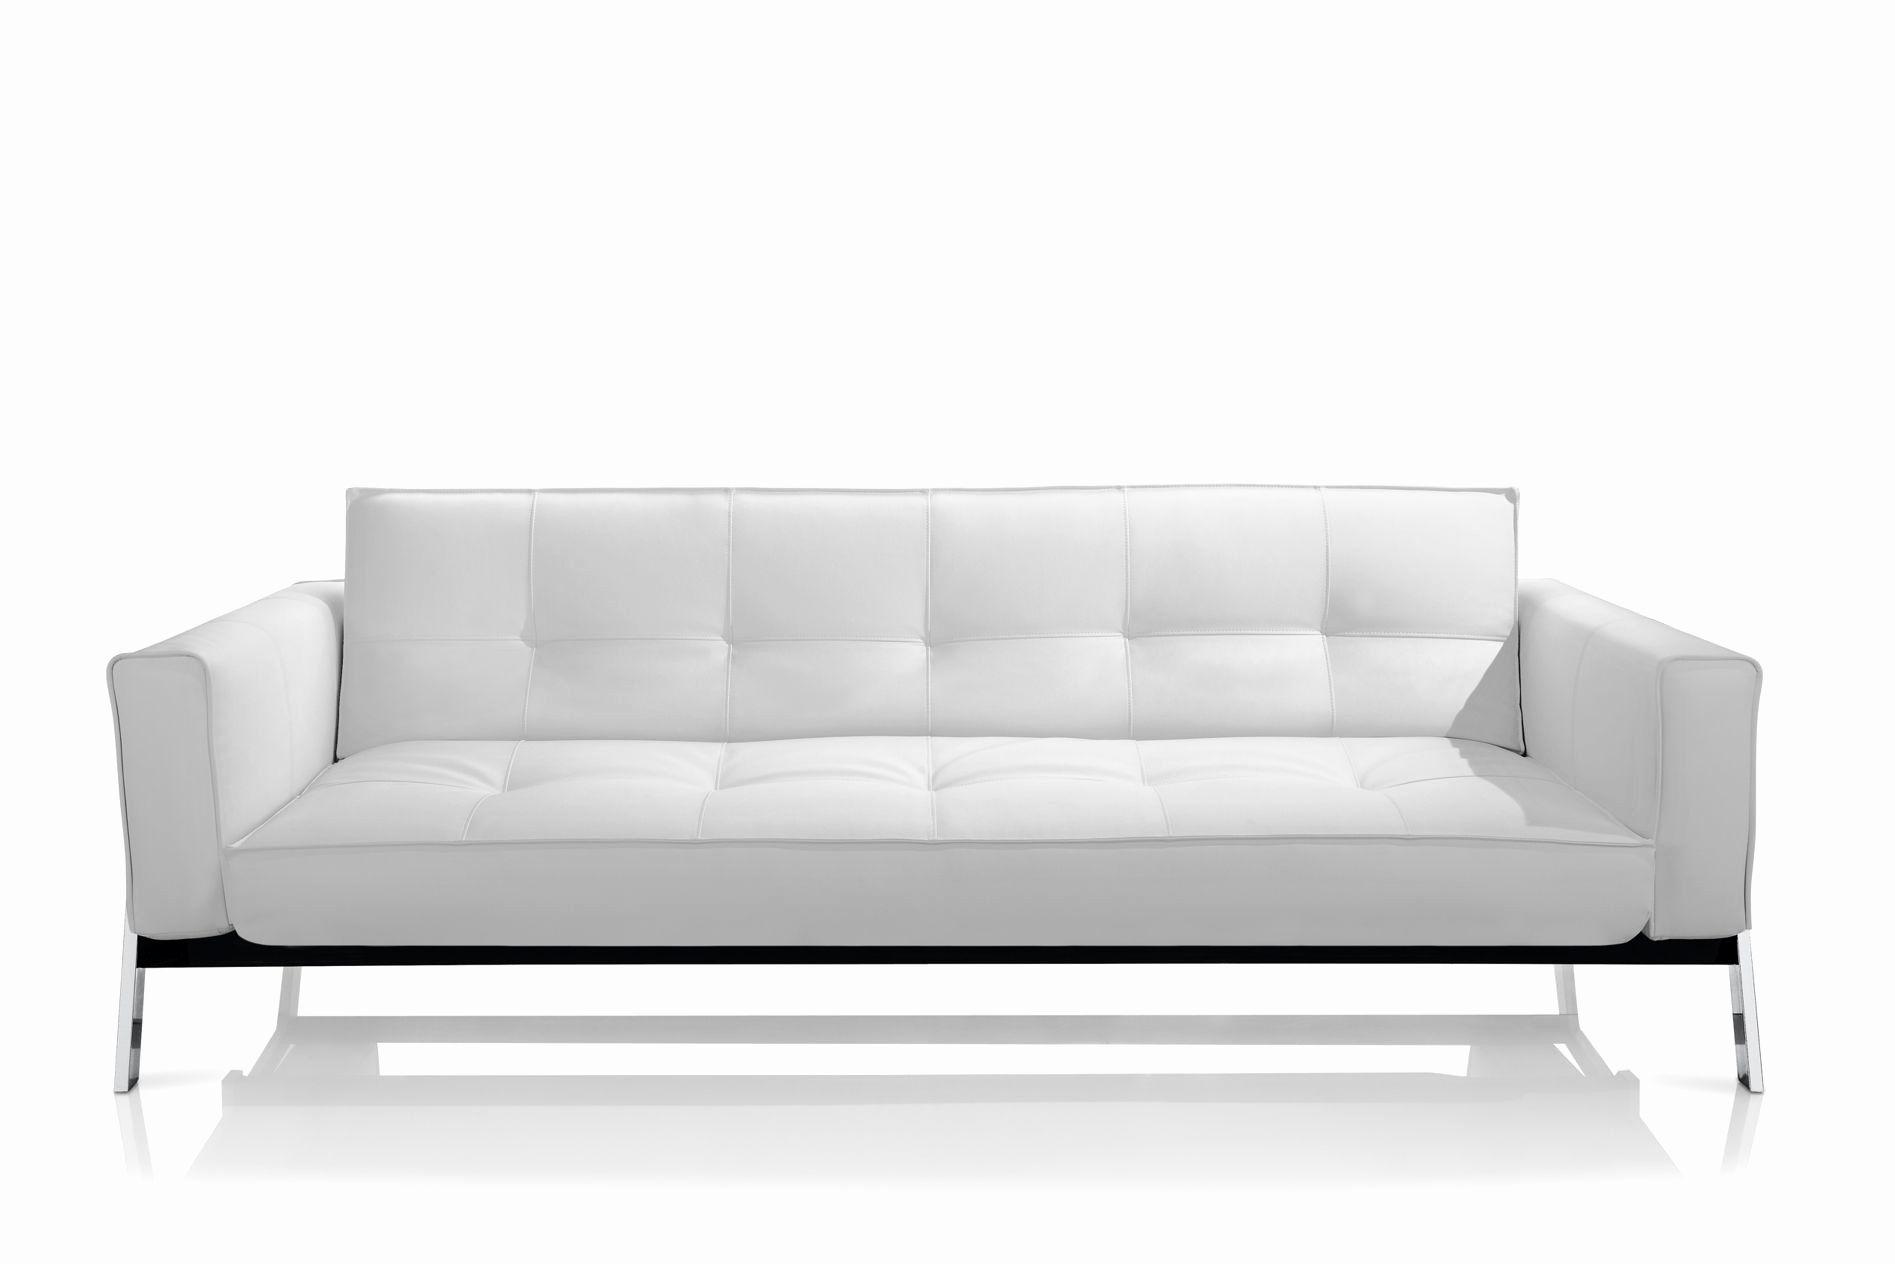 Beautiful Sofa Beds Contemporary Art Contemporary Sofa Beds Design Modern Sofa Bed Modern Leather Sofa White Fabric Sofa